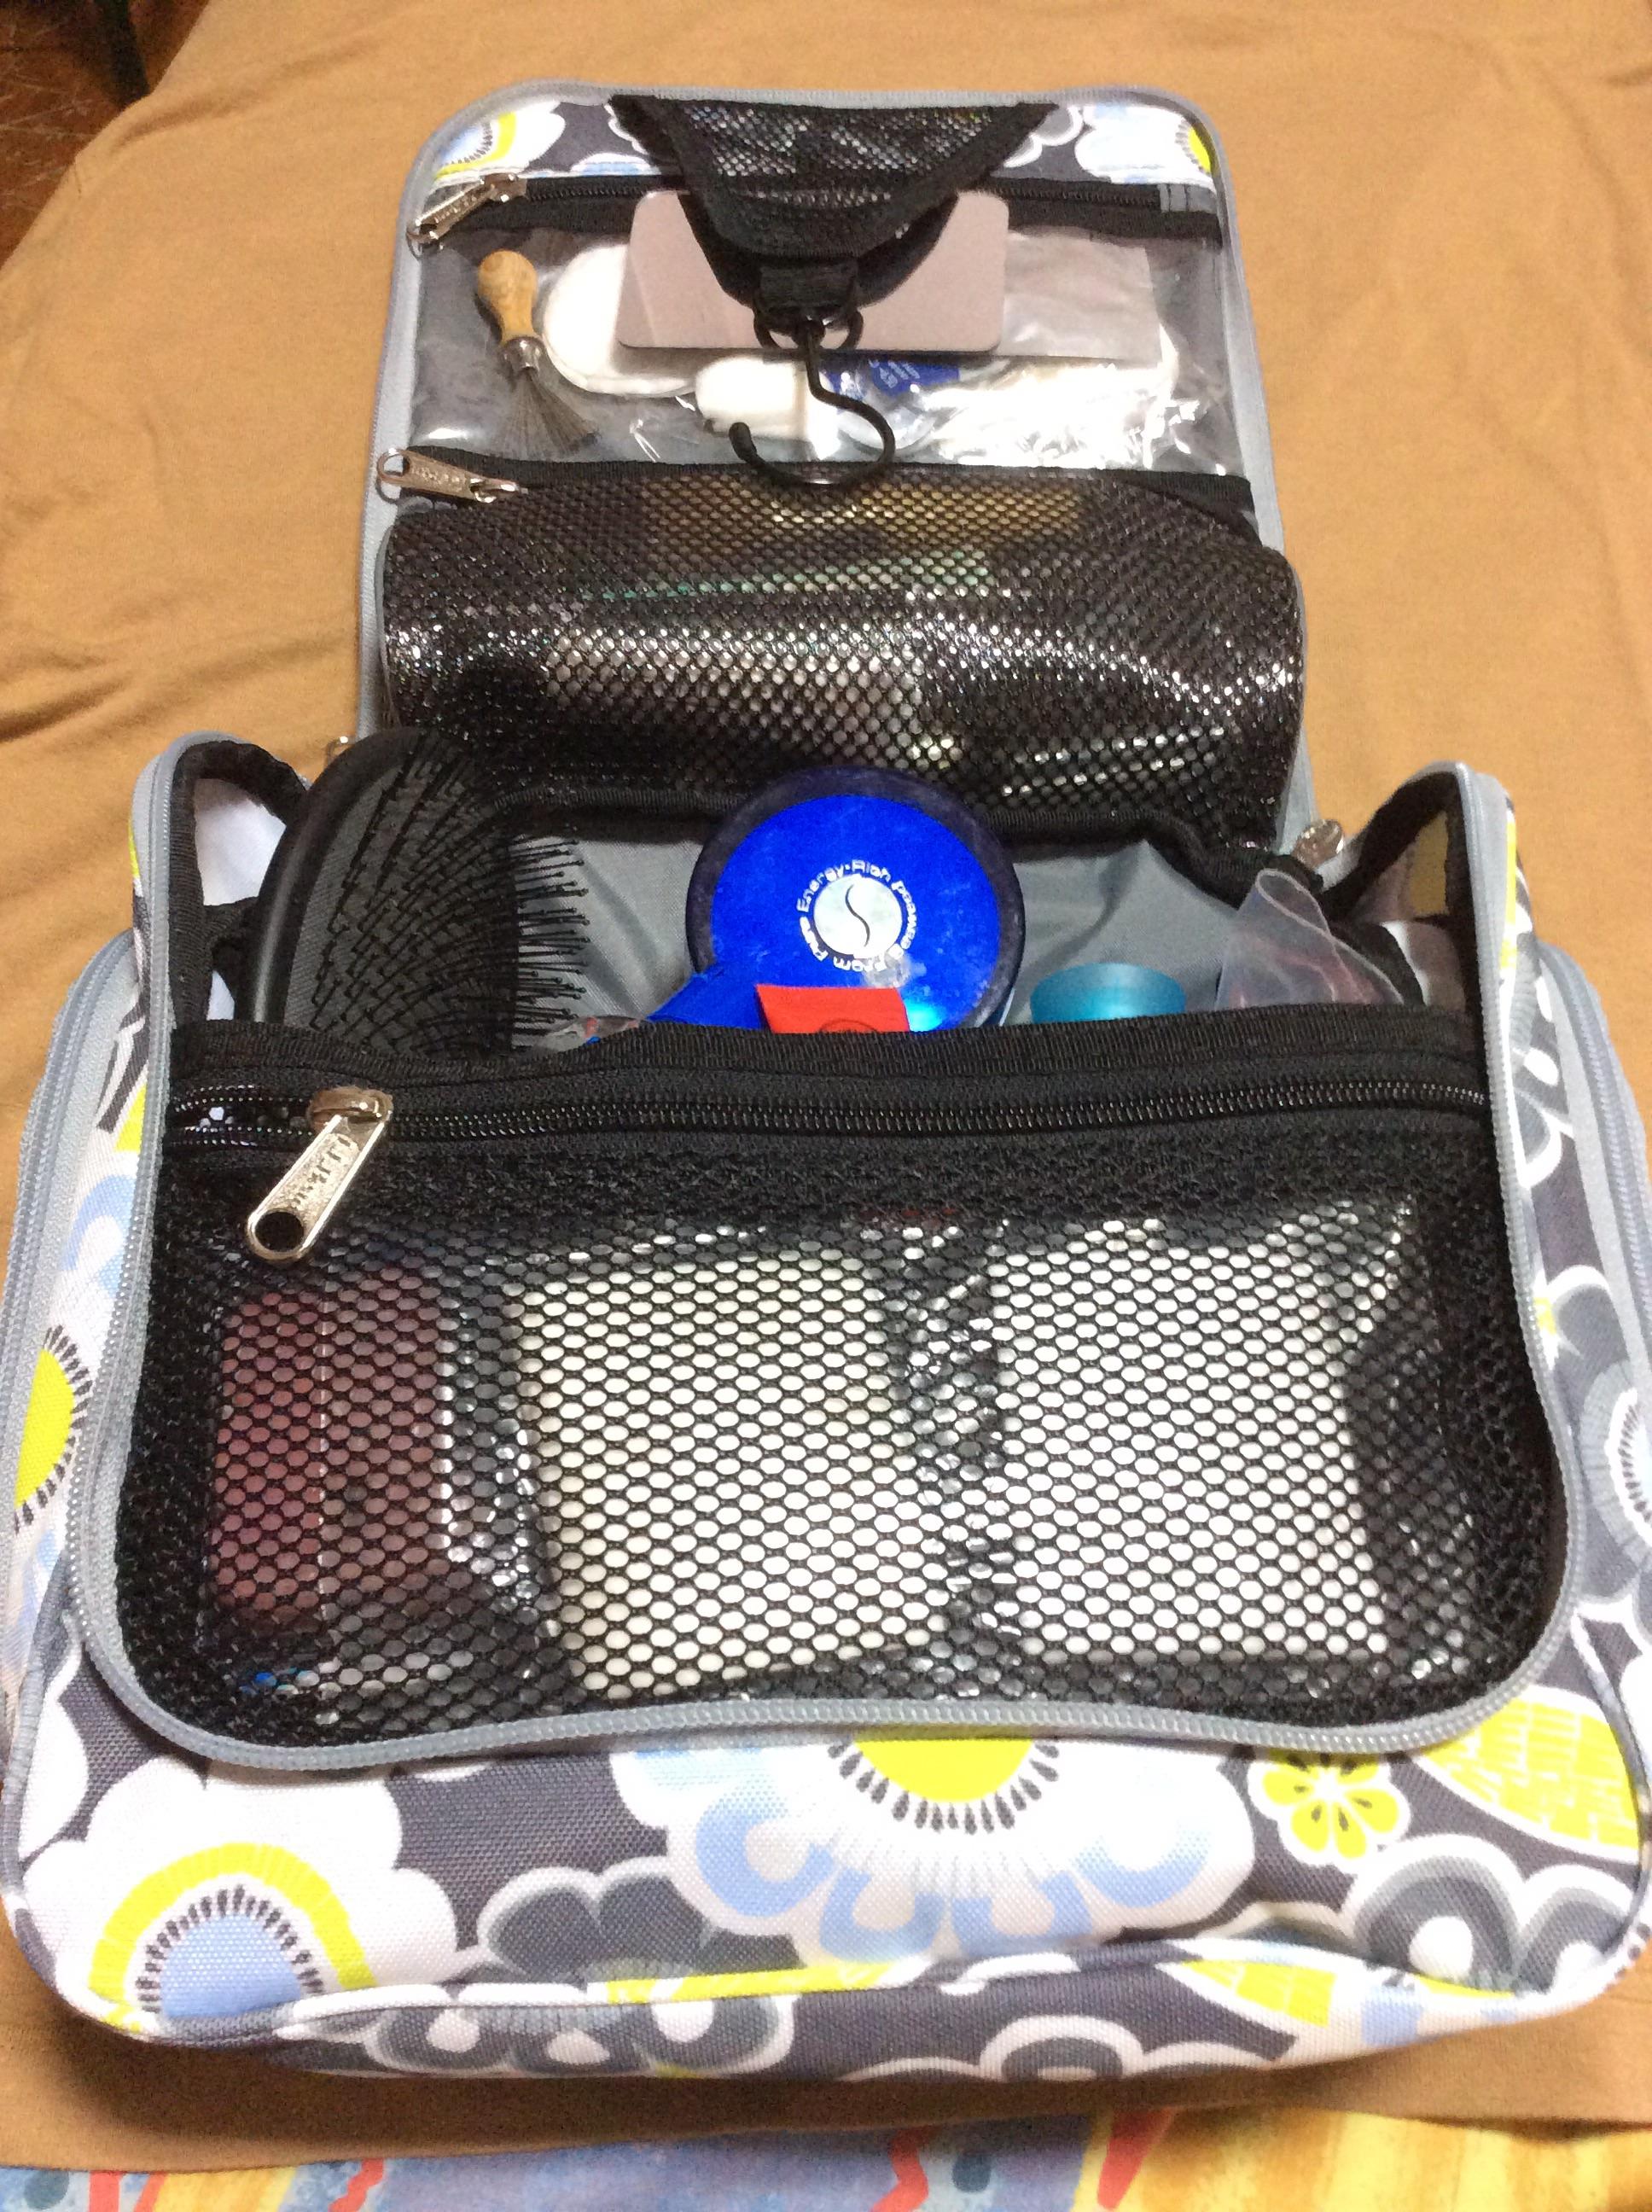 4dfc32116a L.L. Bean Personal Organizer Toiletry Bag